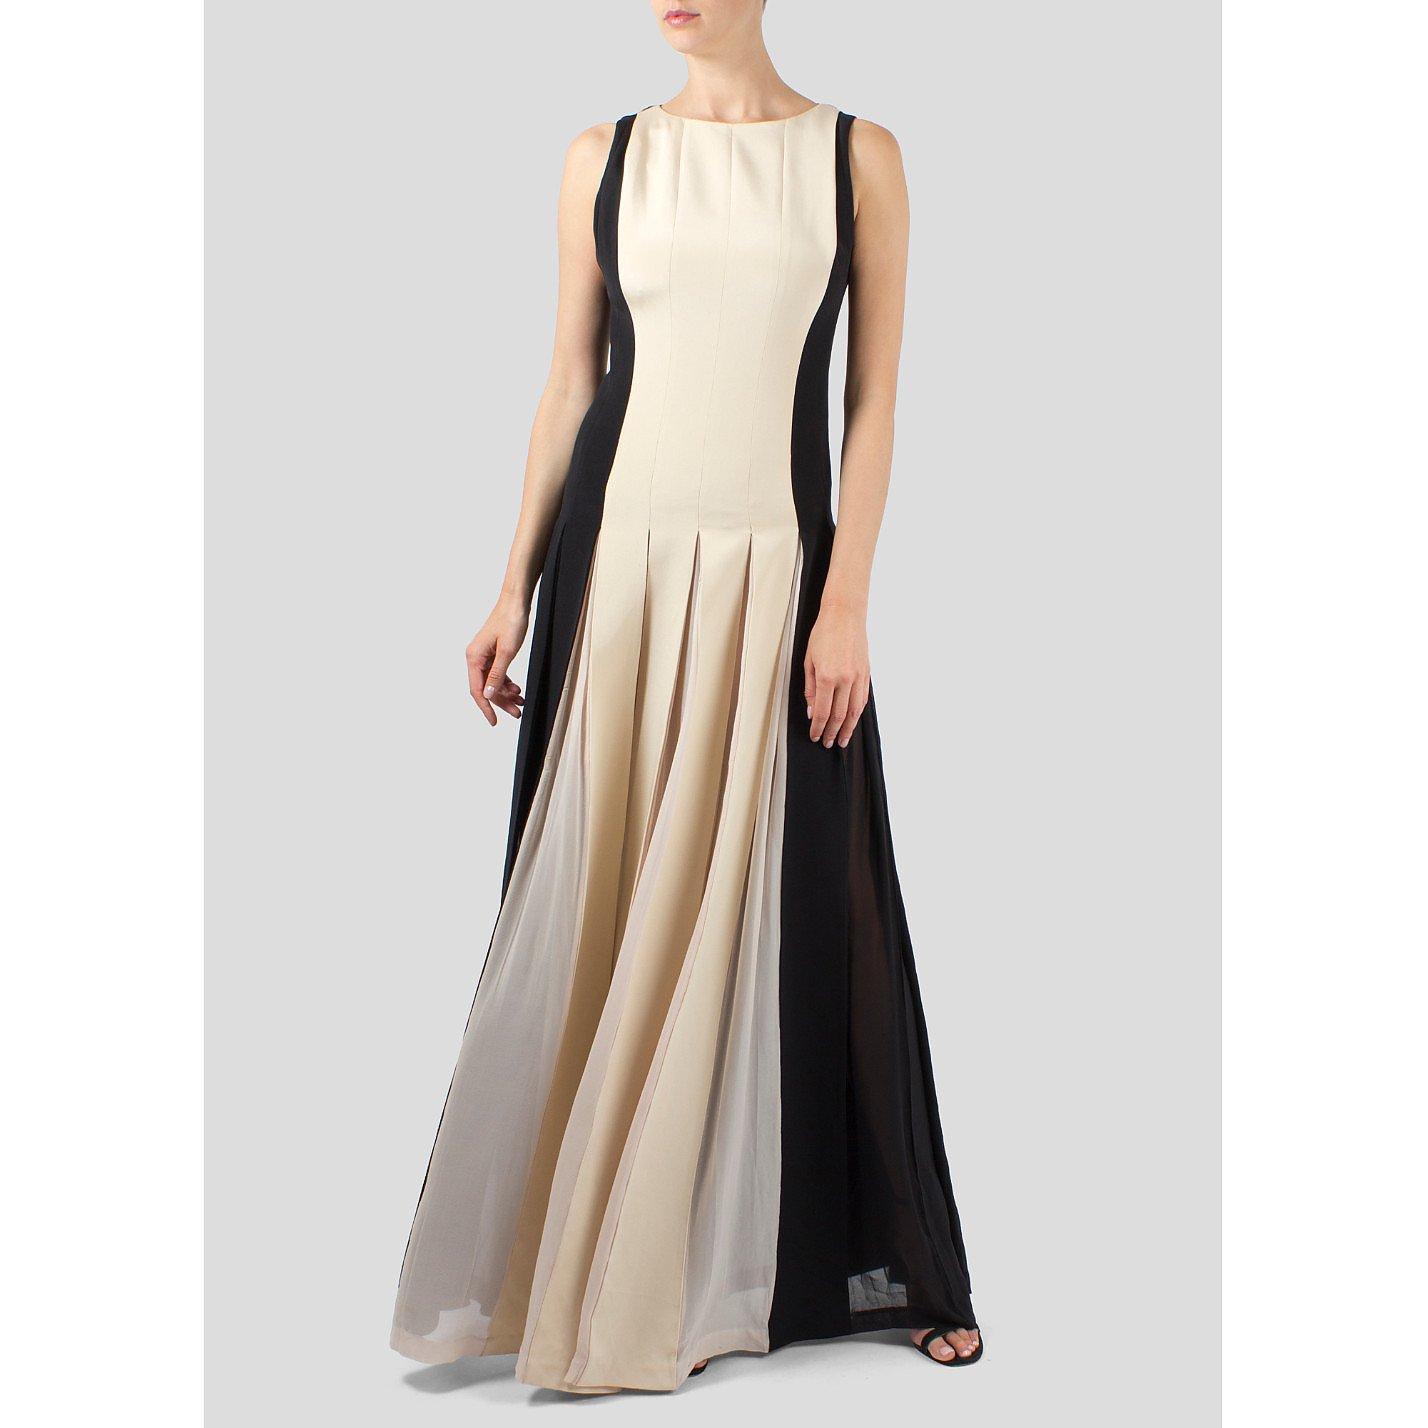 Barbara Casasola Sleeveless Monochrome Gown